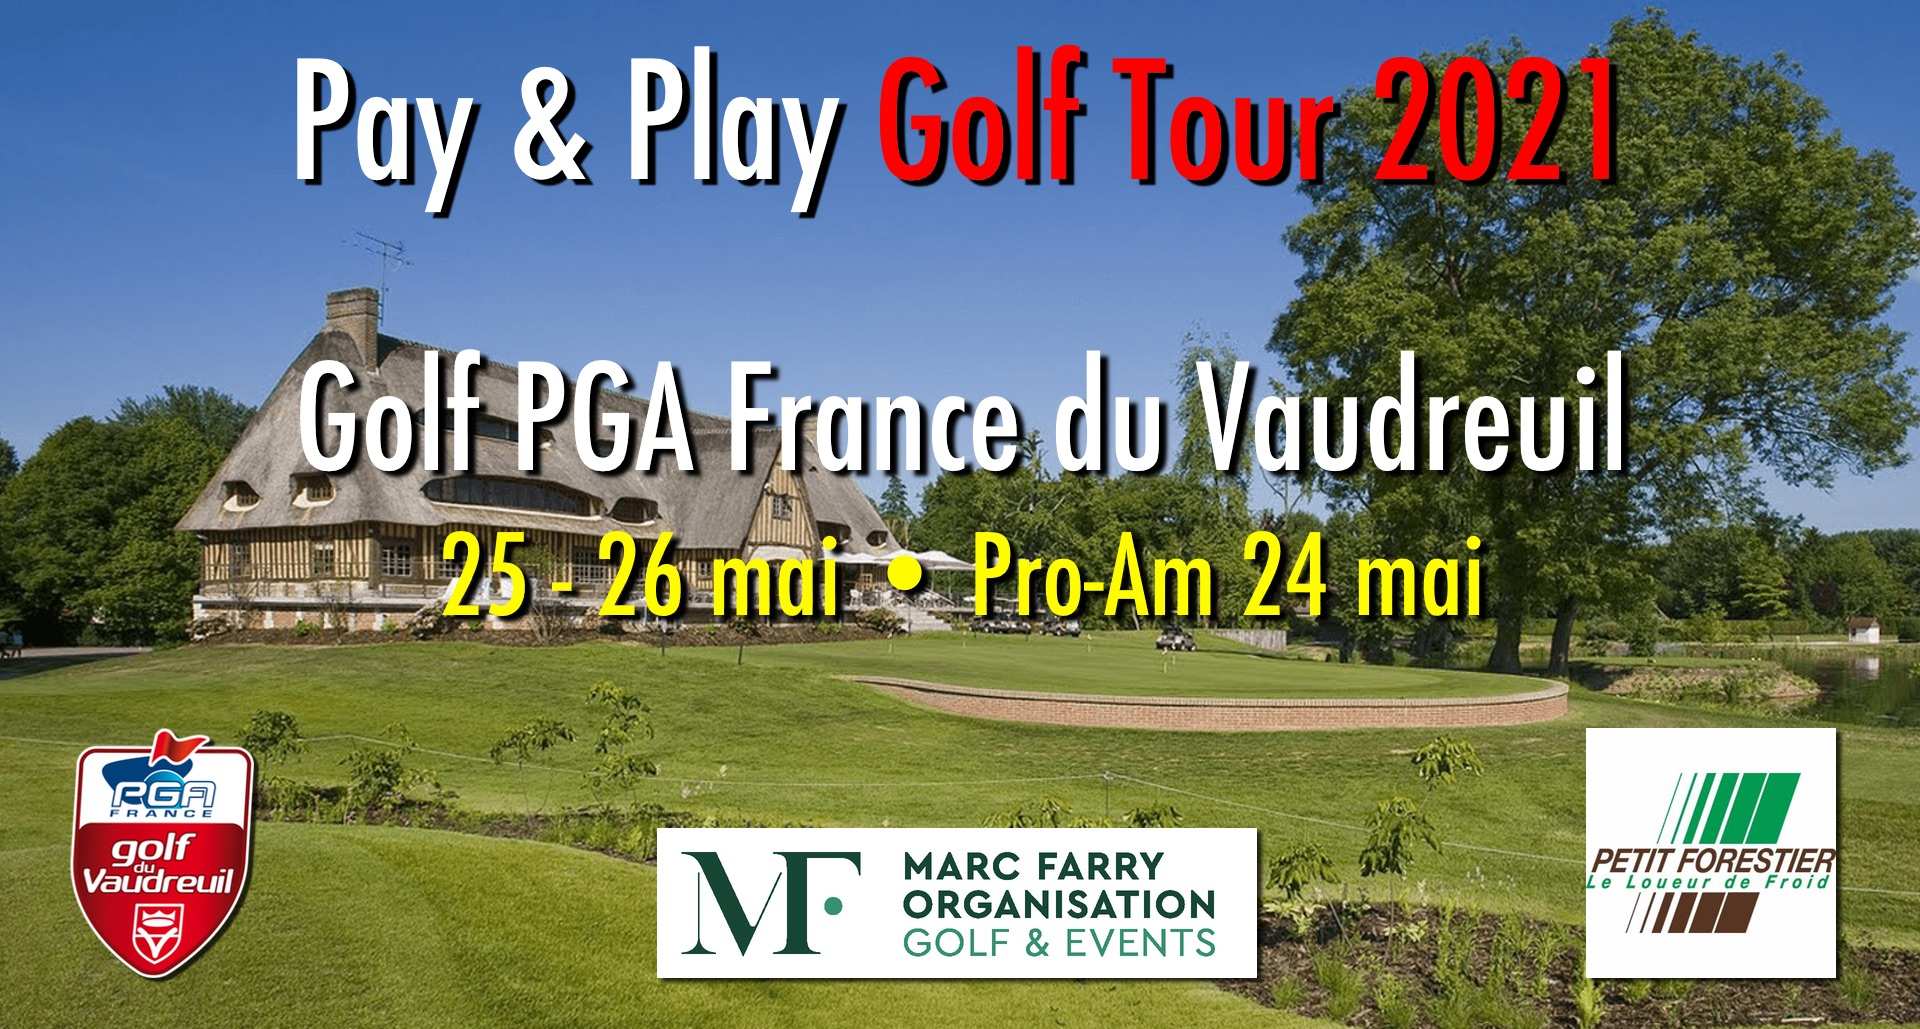 PPGT 2021 Pro Golf PGA France Le Vaudreuil